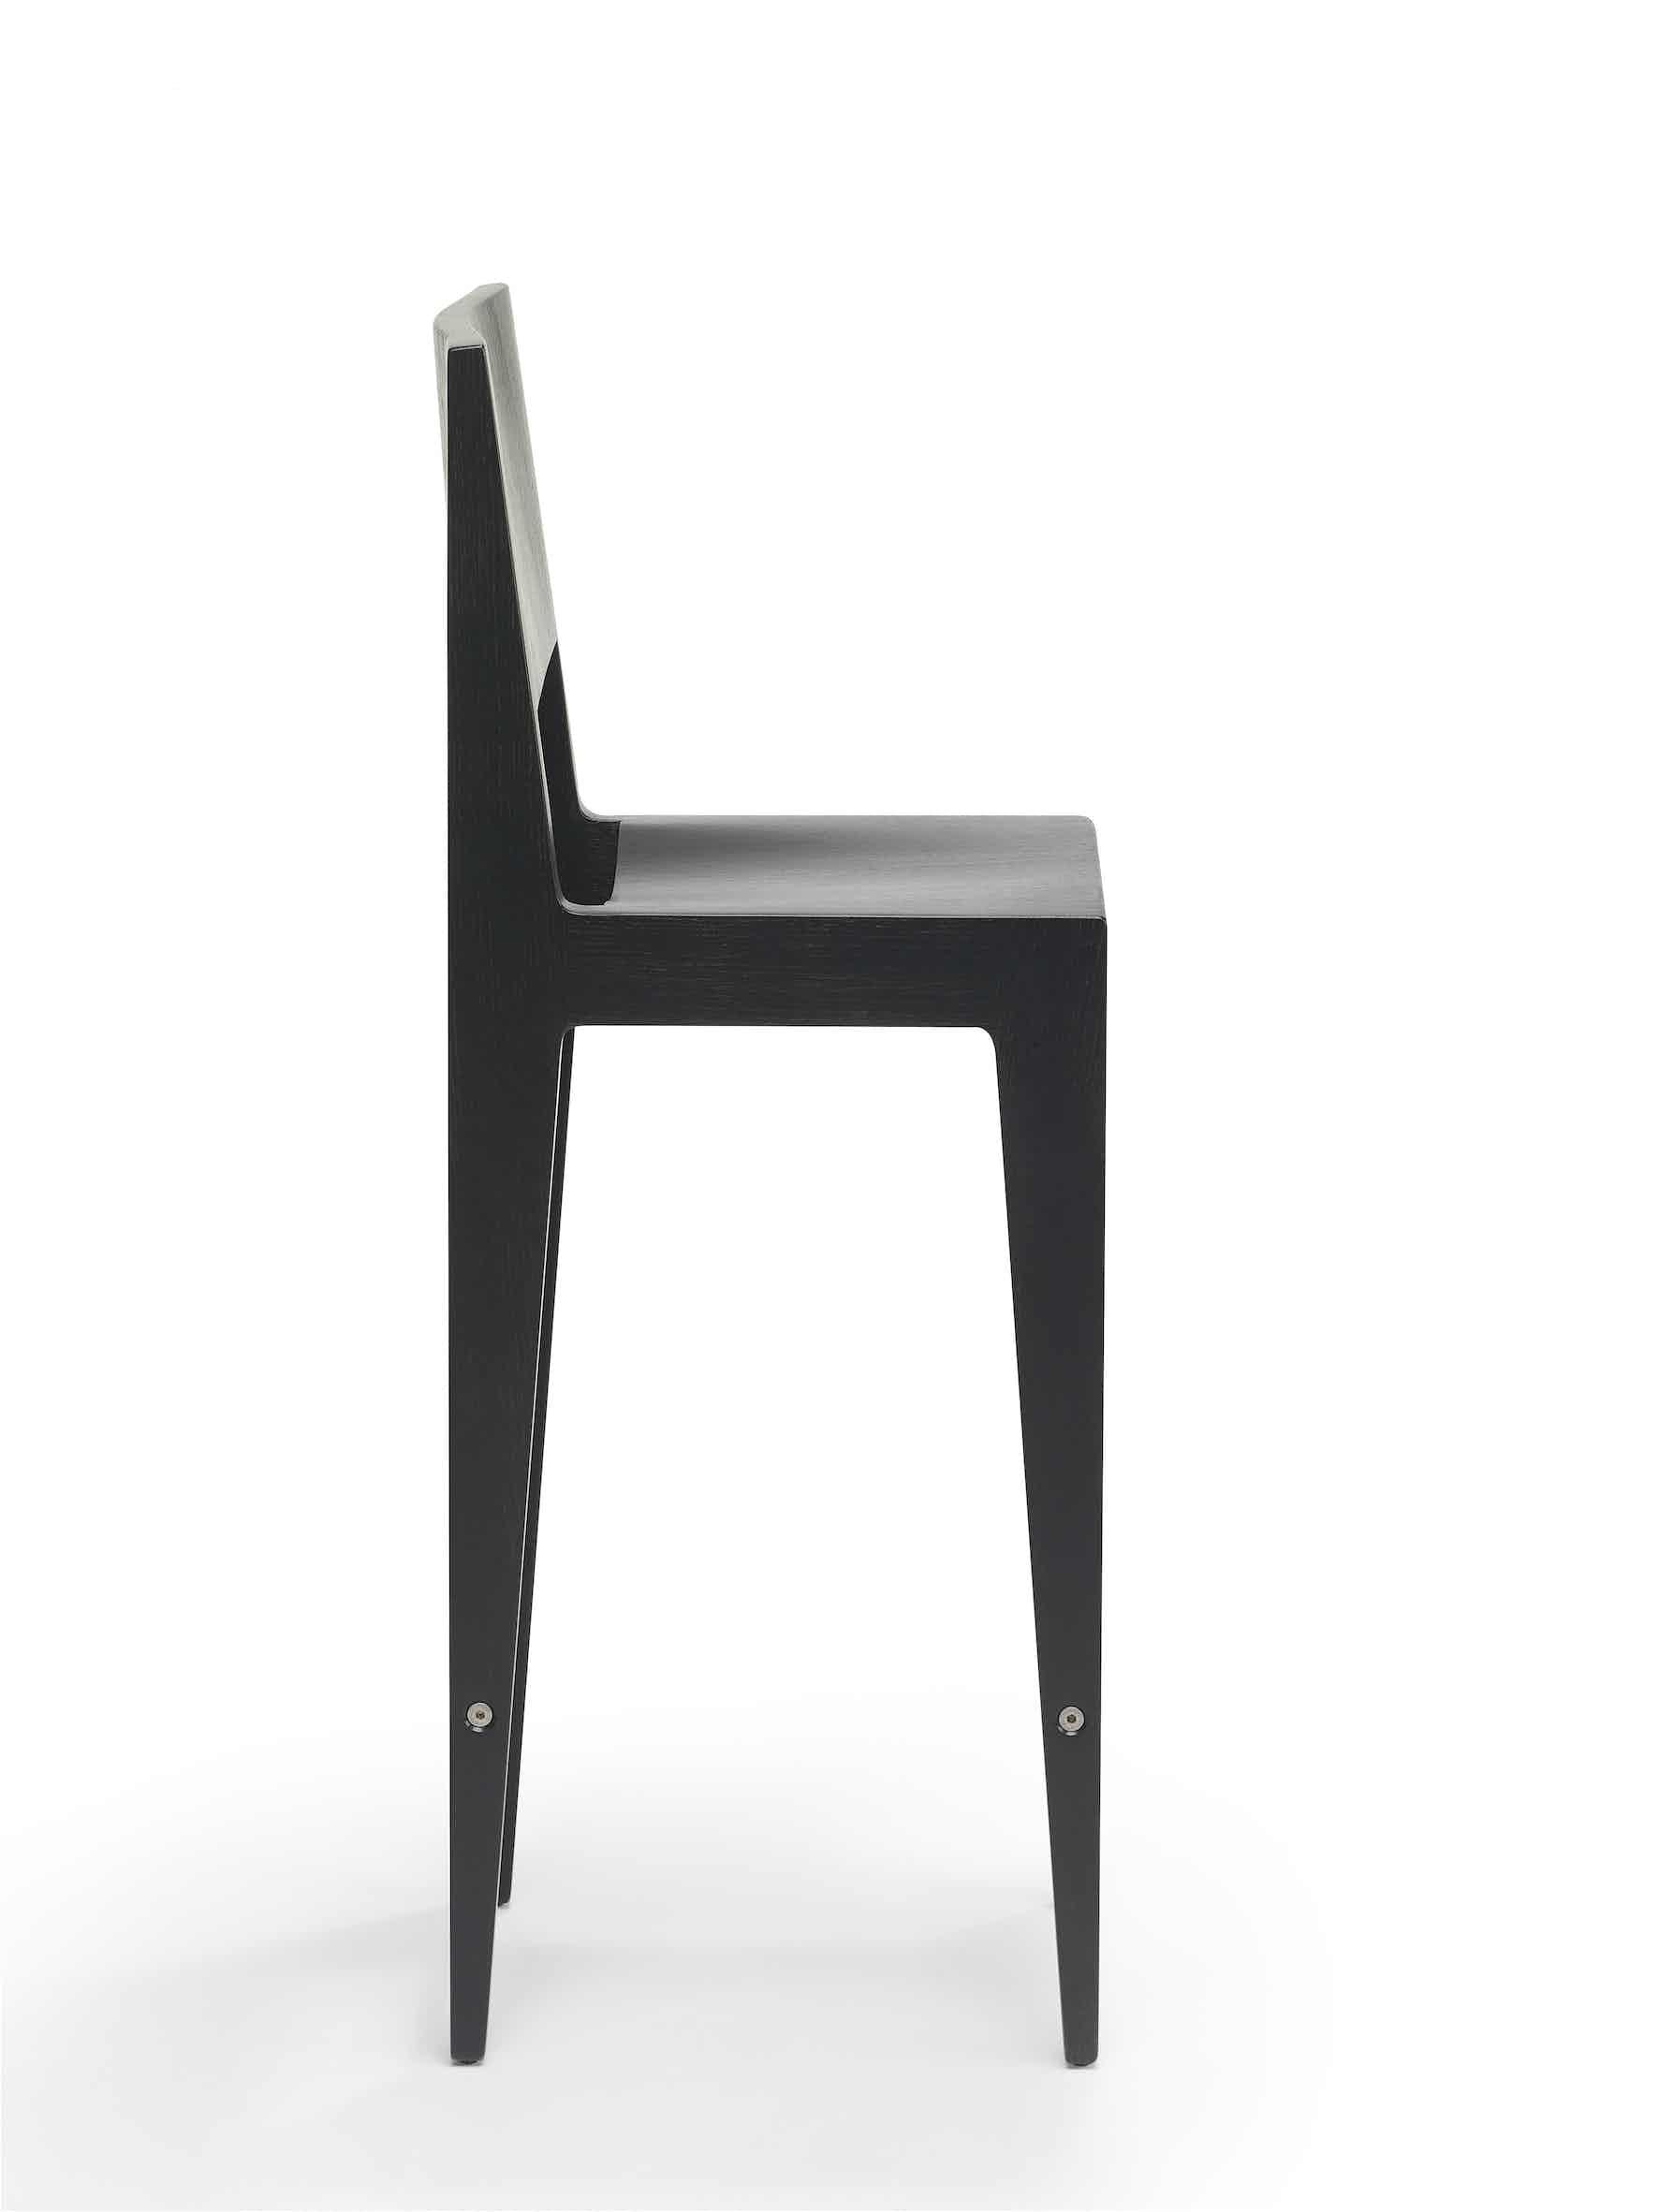 Spectrum Furniture Black Side Toos Stool Haute Living